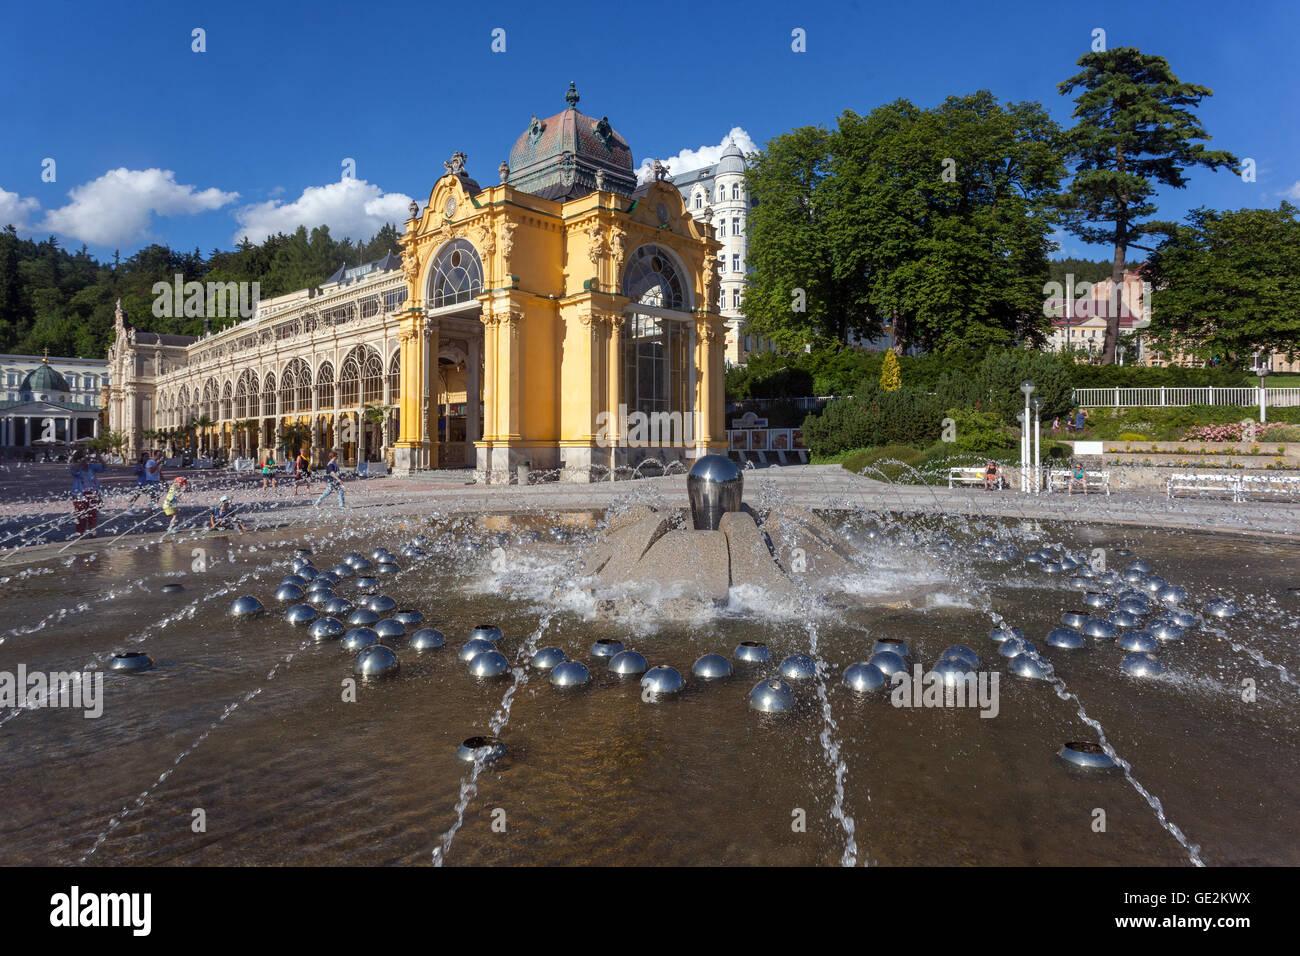 Colonnade, Marianske Lazne (Marienbad), a spa town, West Bohemia, Czech Republic - Stock Image